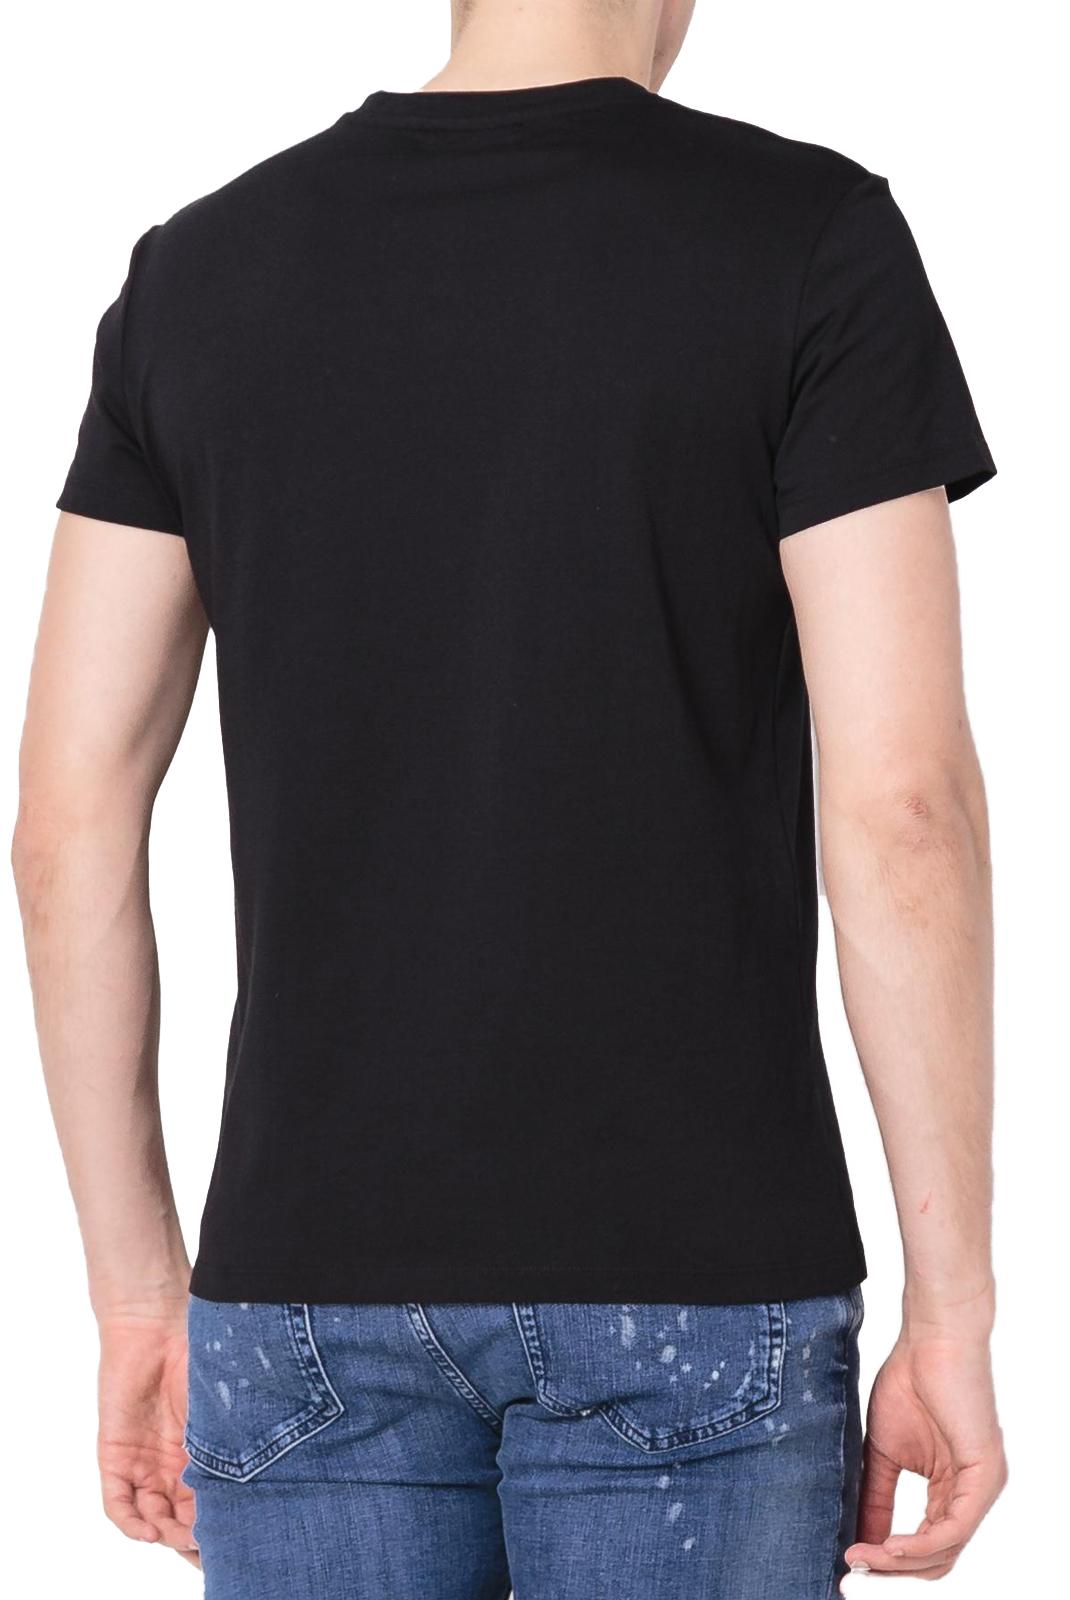 Tee-shirts  Balmain W8H8601 BLACK/ARGENT